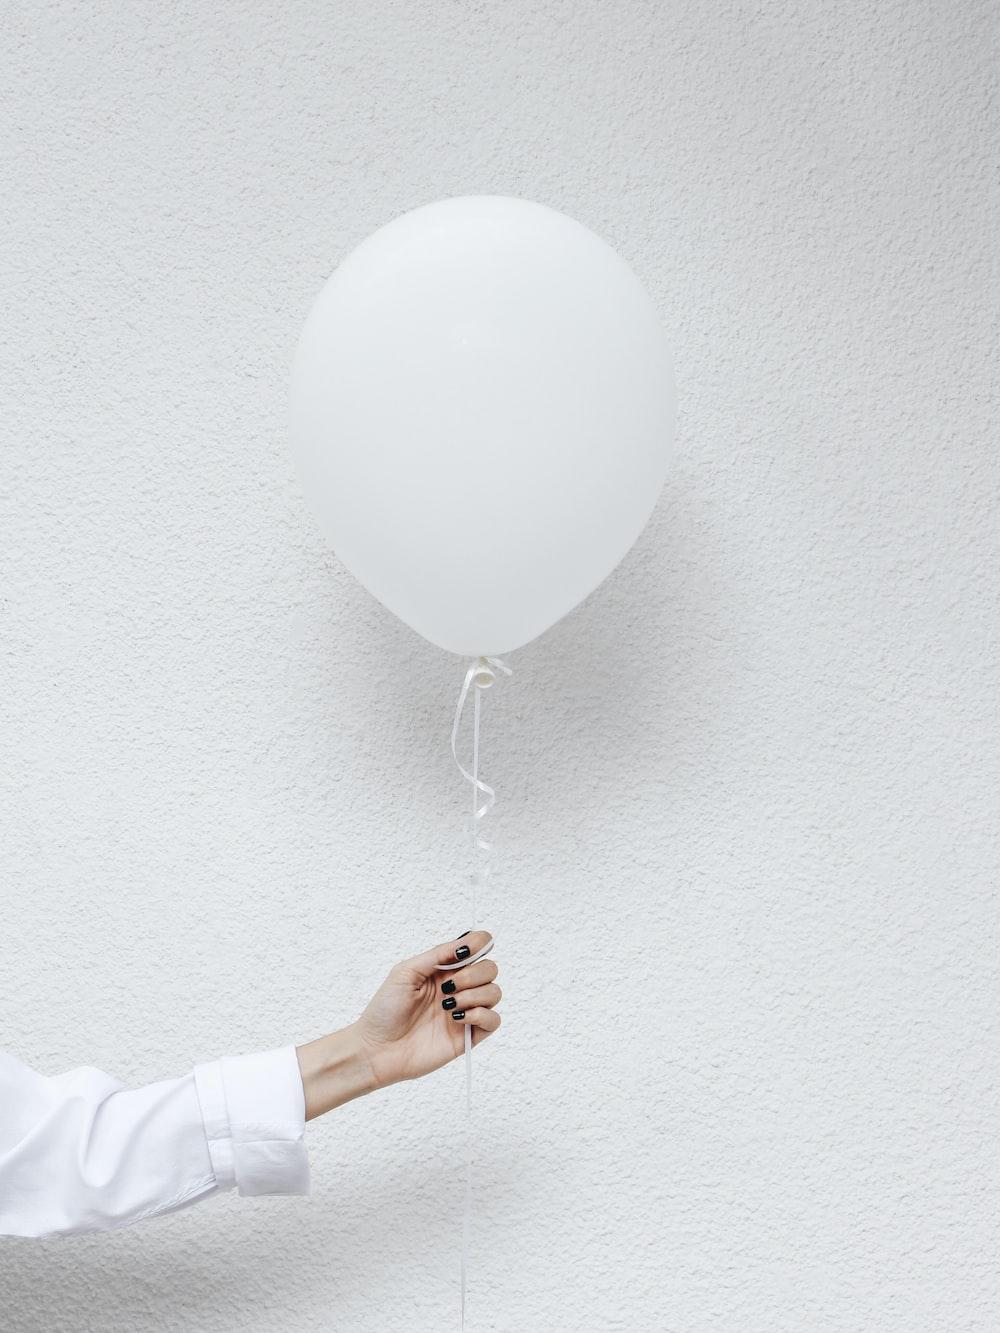 person holding white balloons near white wall